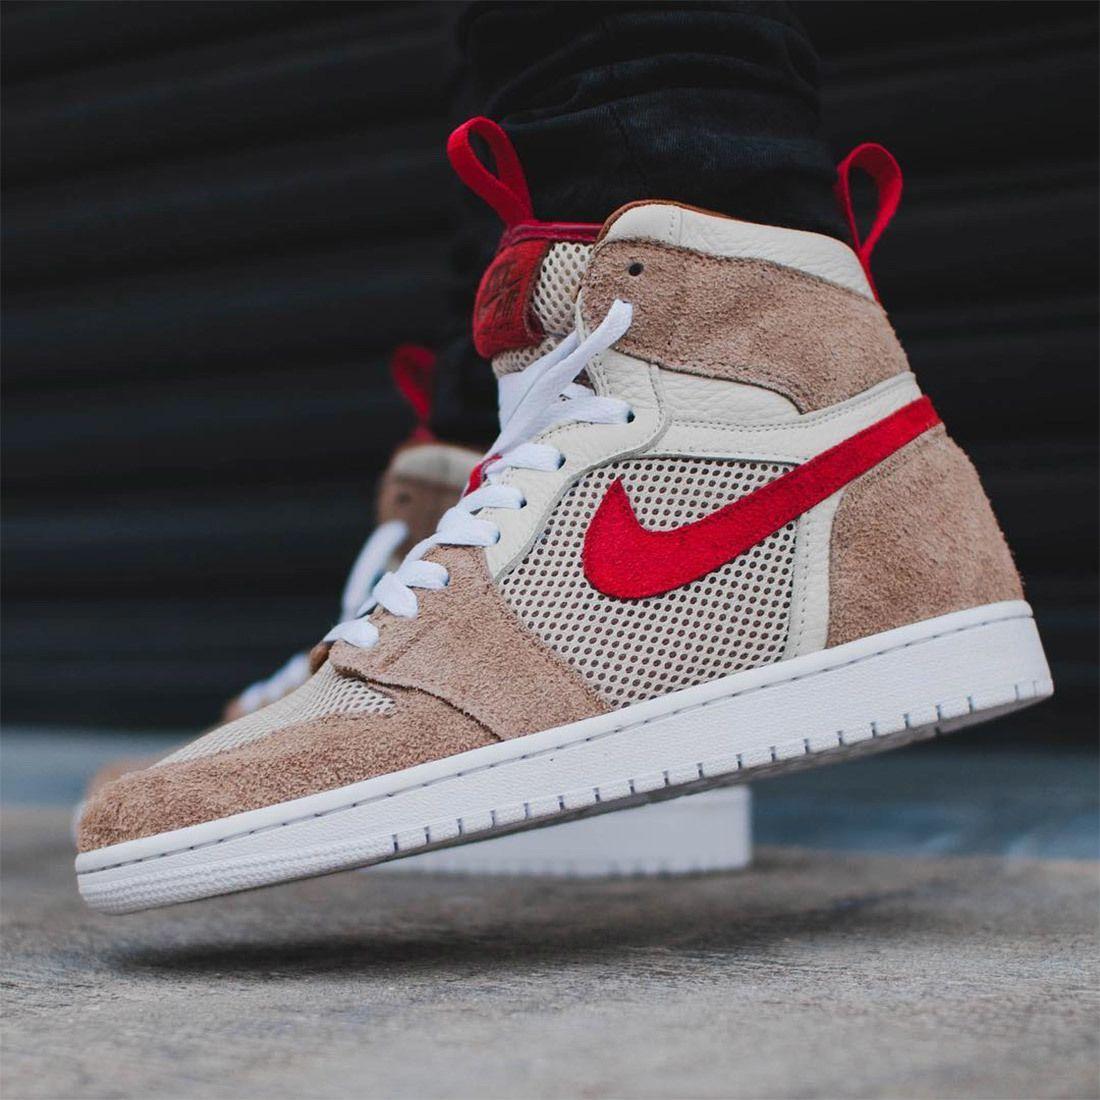 Chase Shiel X Fiammastudios Tom Sachs Nike Mars Yard Shoe Air Jordan 1 Sneaker Freaker 1